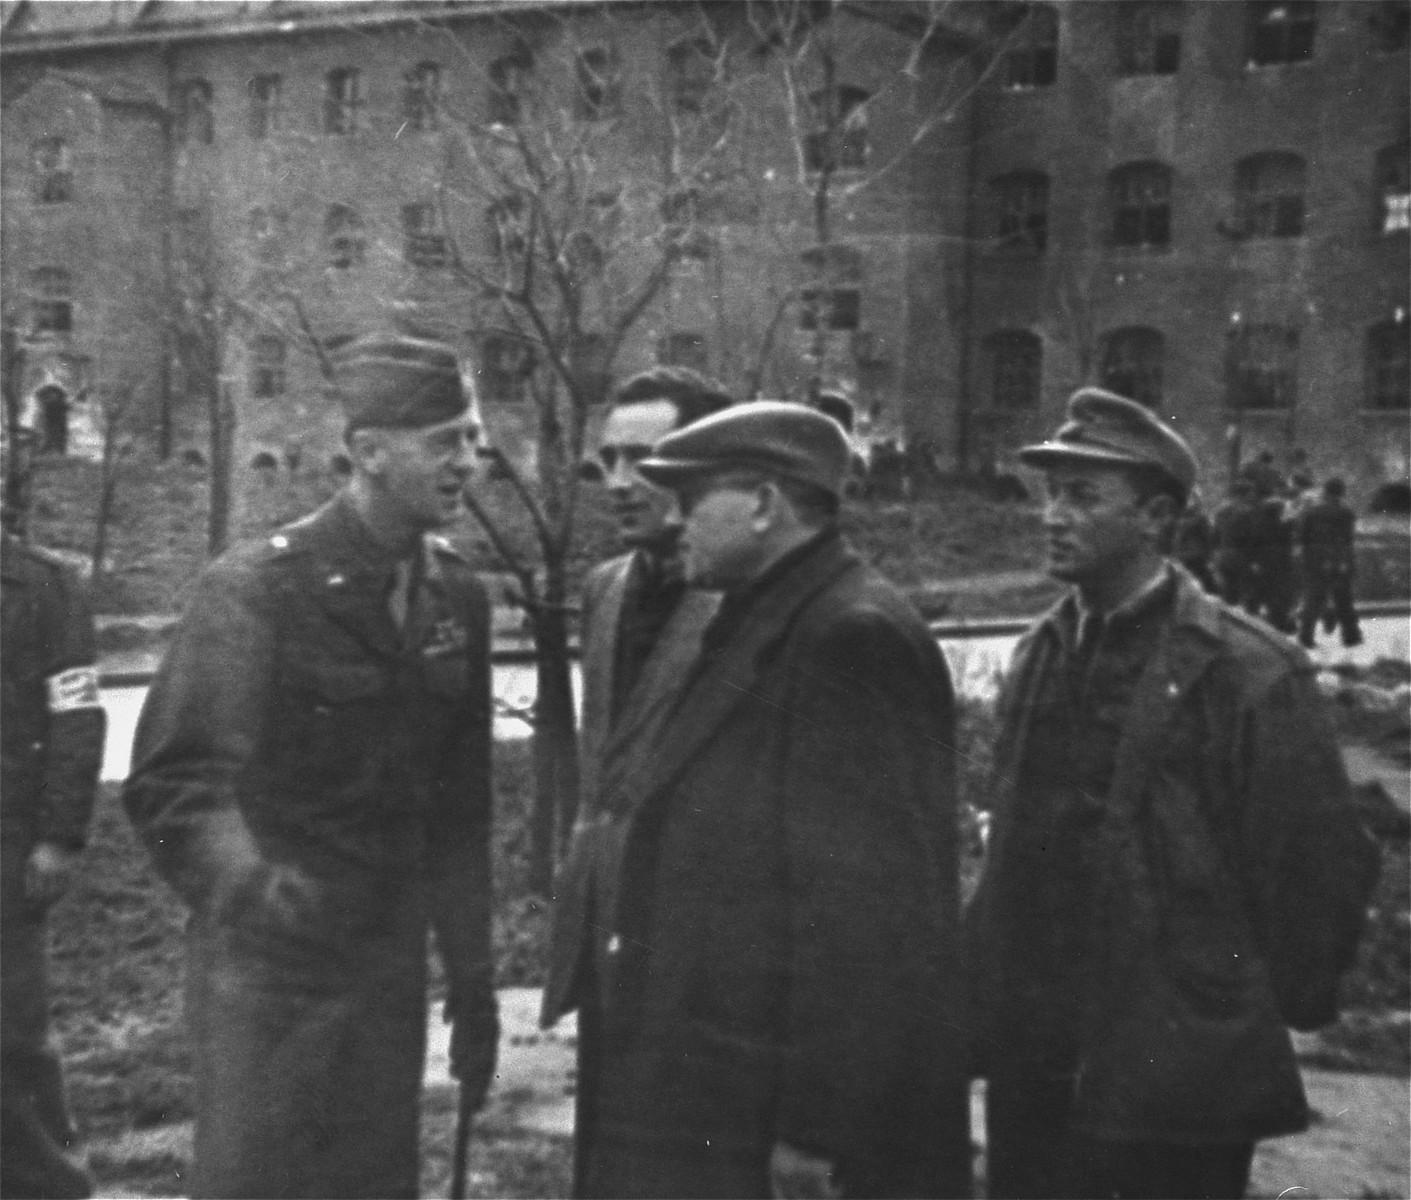 General Onslow S. Rolfe (left) and Dr. Samuel Gringaus (center) speak to Jewish DPs at the Landsberg displaced persons camp.